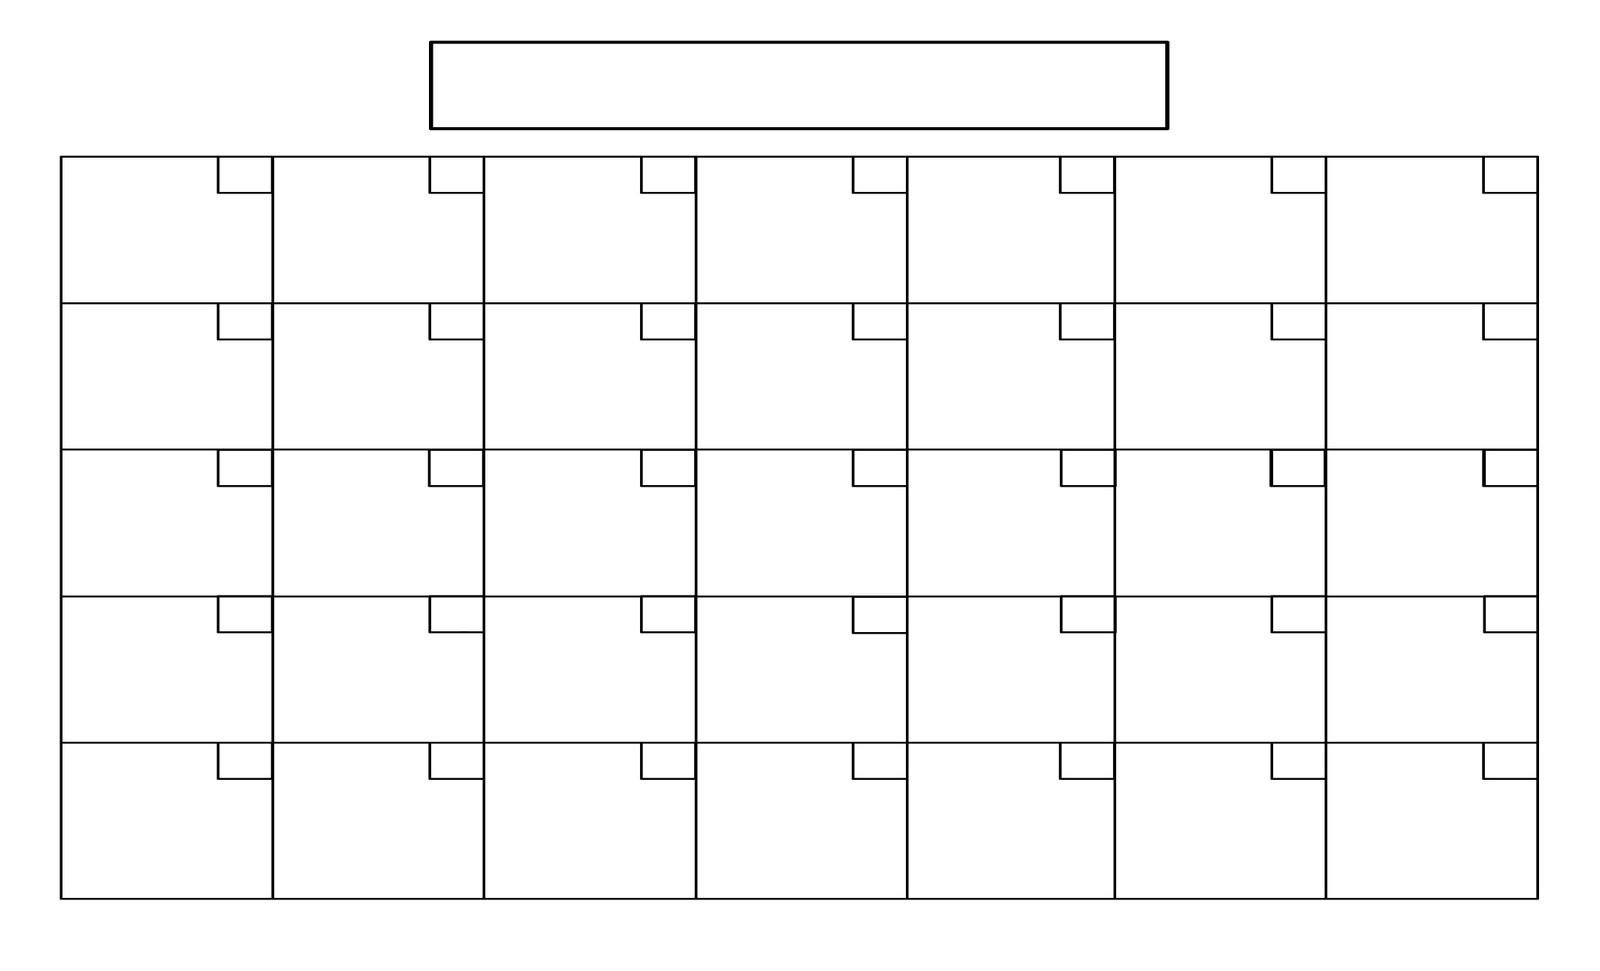 Blank Calendar Template No Dates   Calendar Template Printable for Remarkable Calendar Template